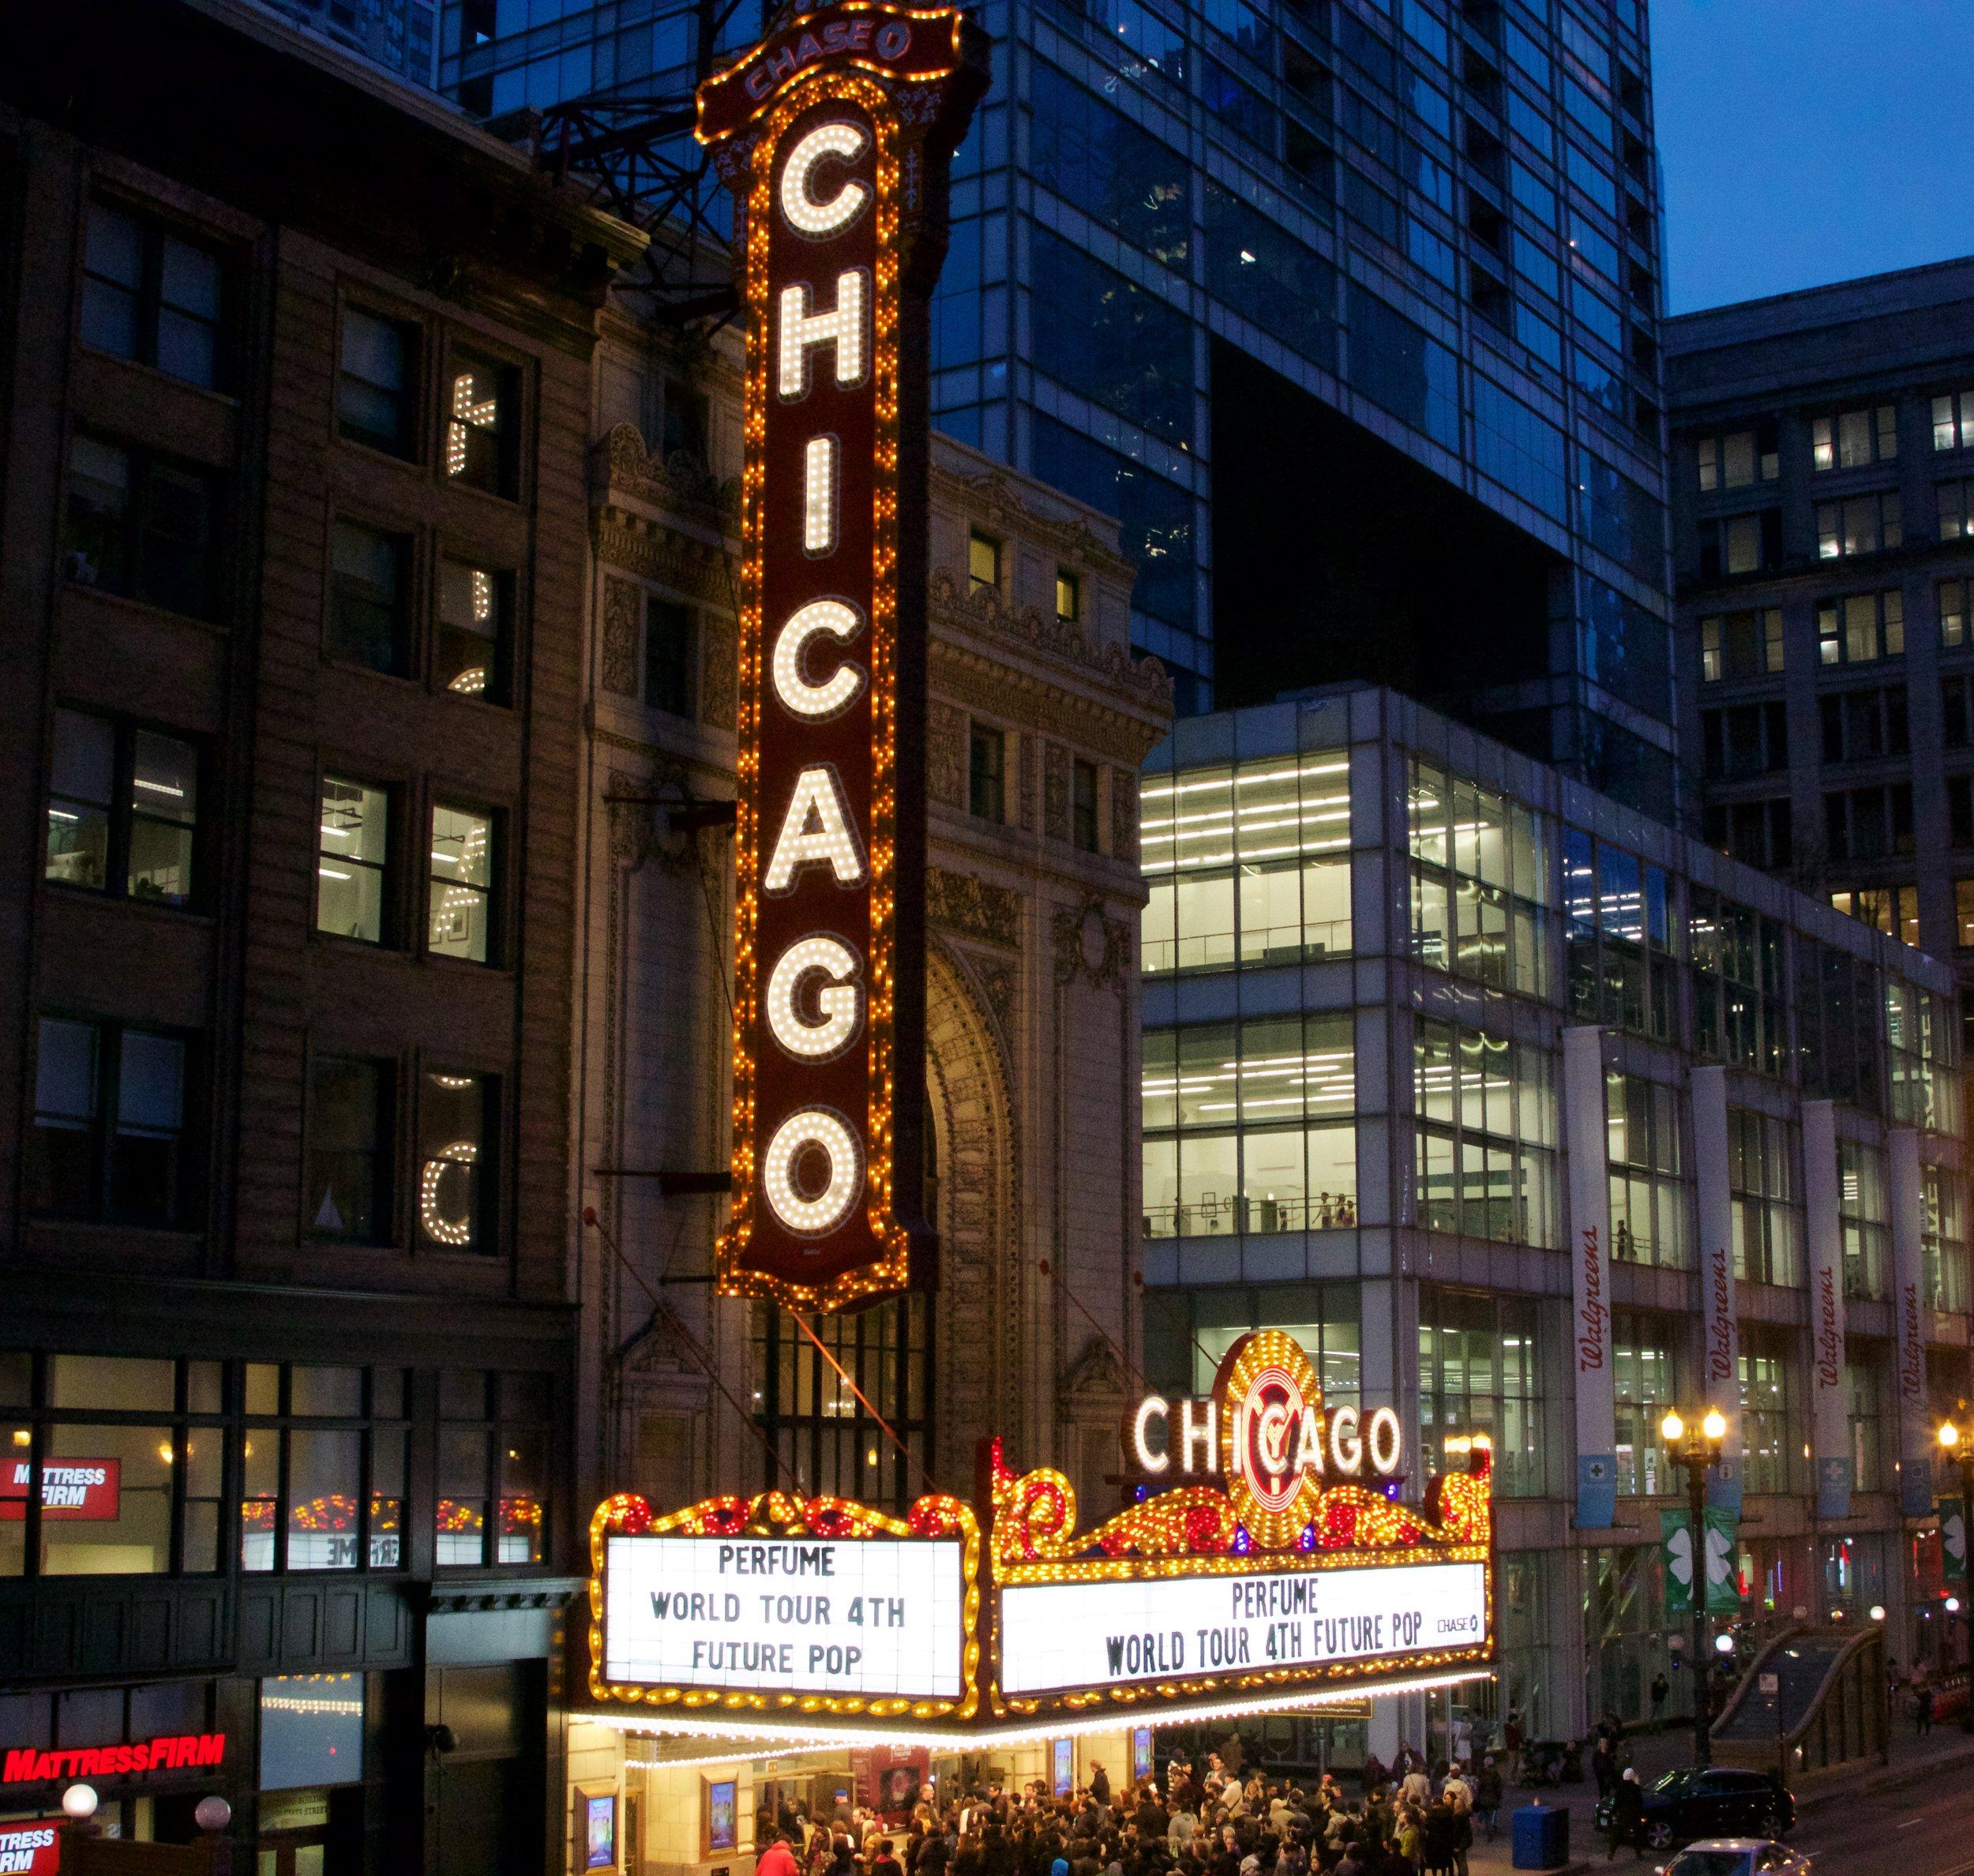 sun_chicago 2.jpg